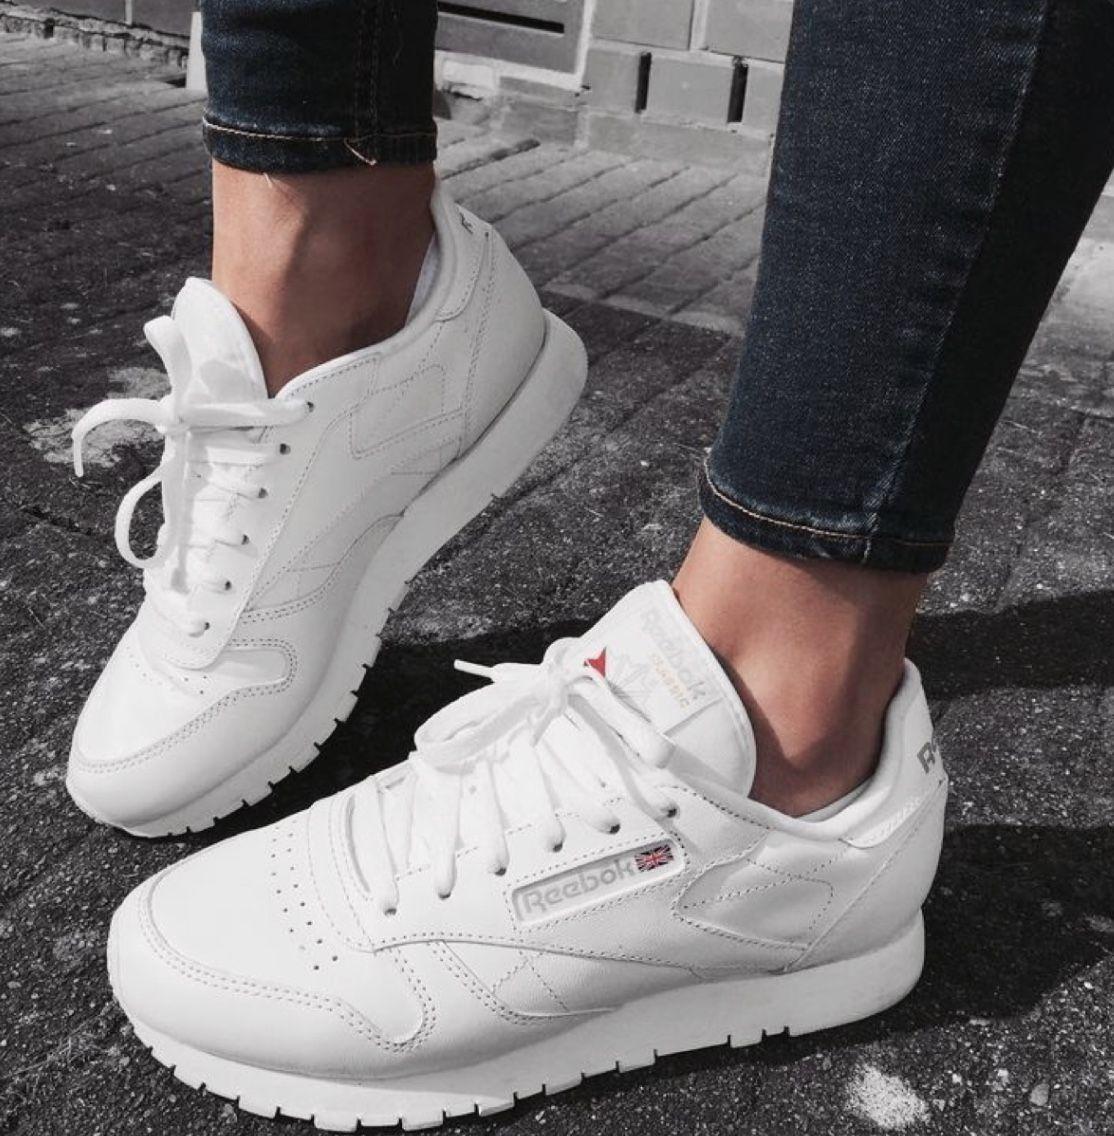 Reebok classic womens, Reebok sneakers